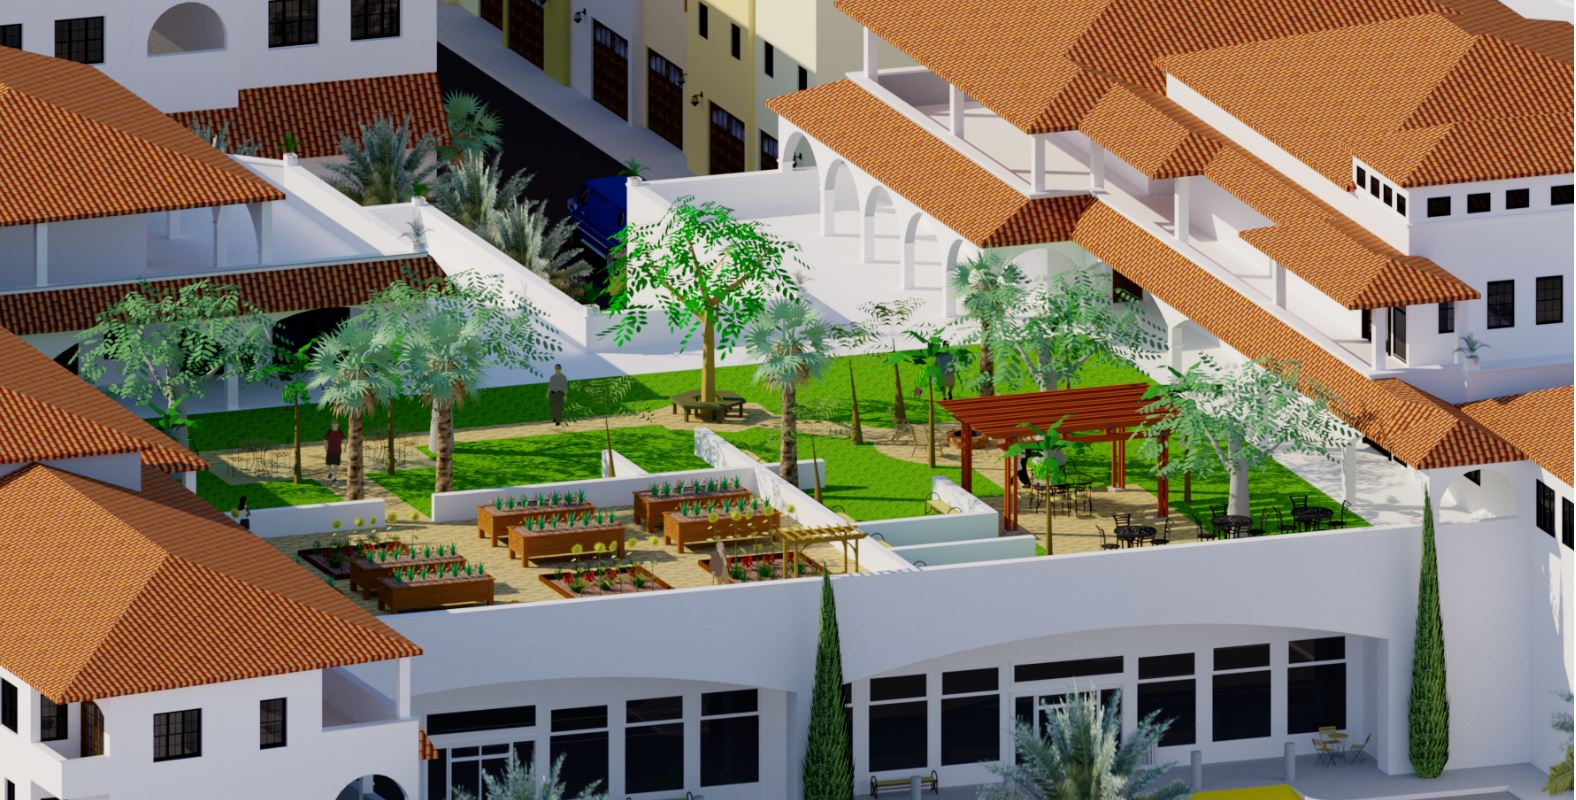 RooftopGarden_CommunalSpace.JPG